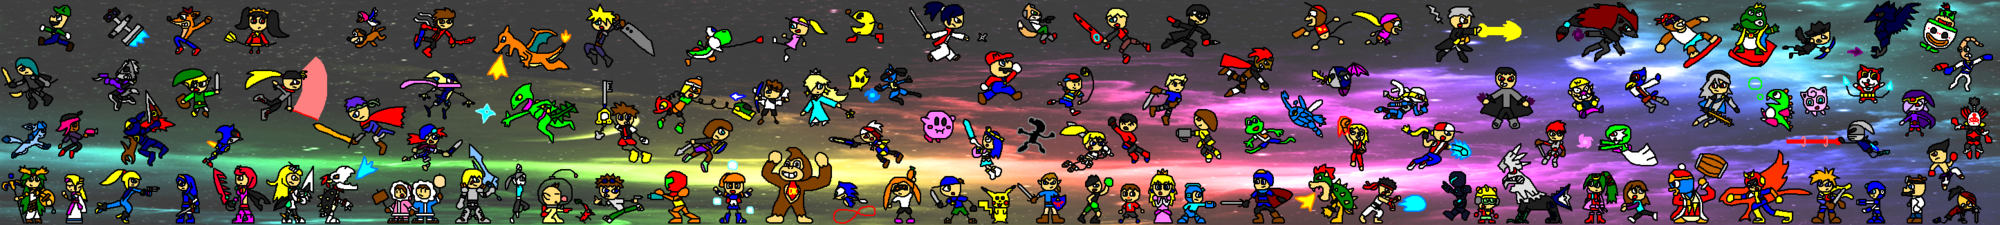 Super Smash Bros  Neo: Reboot - Downloadable Content